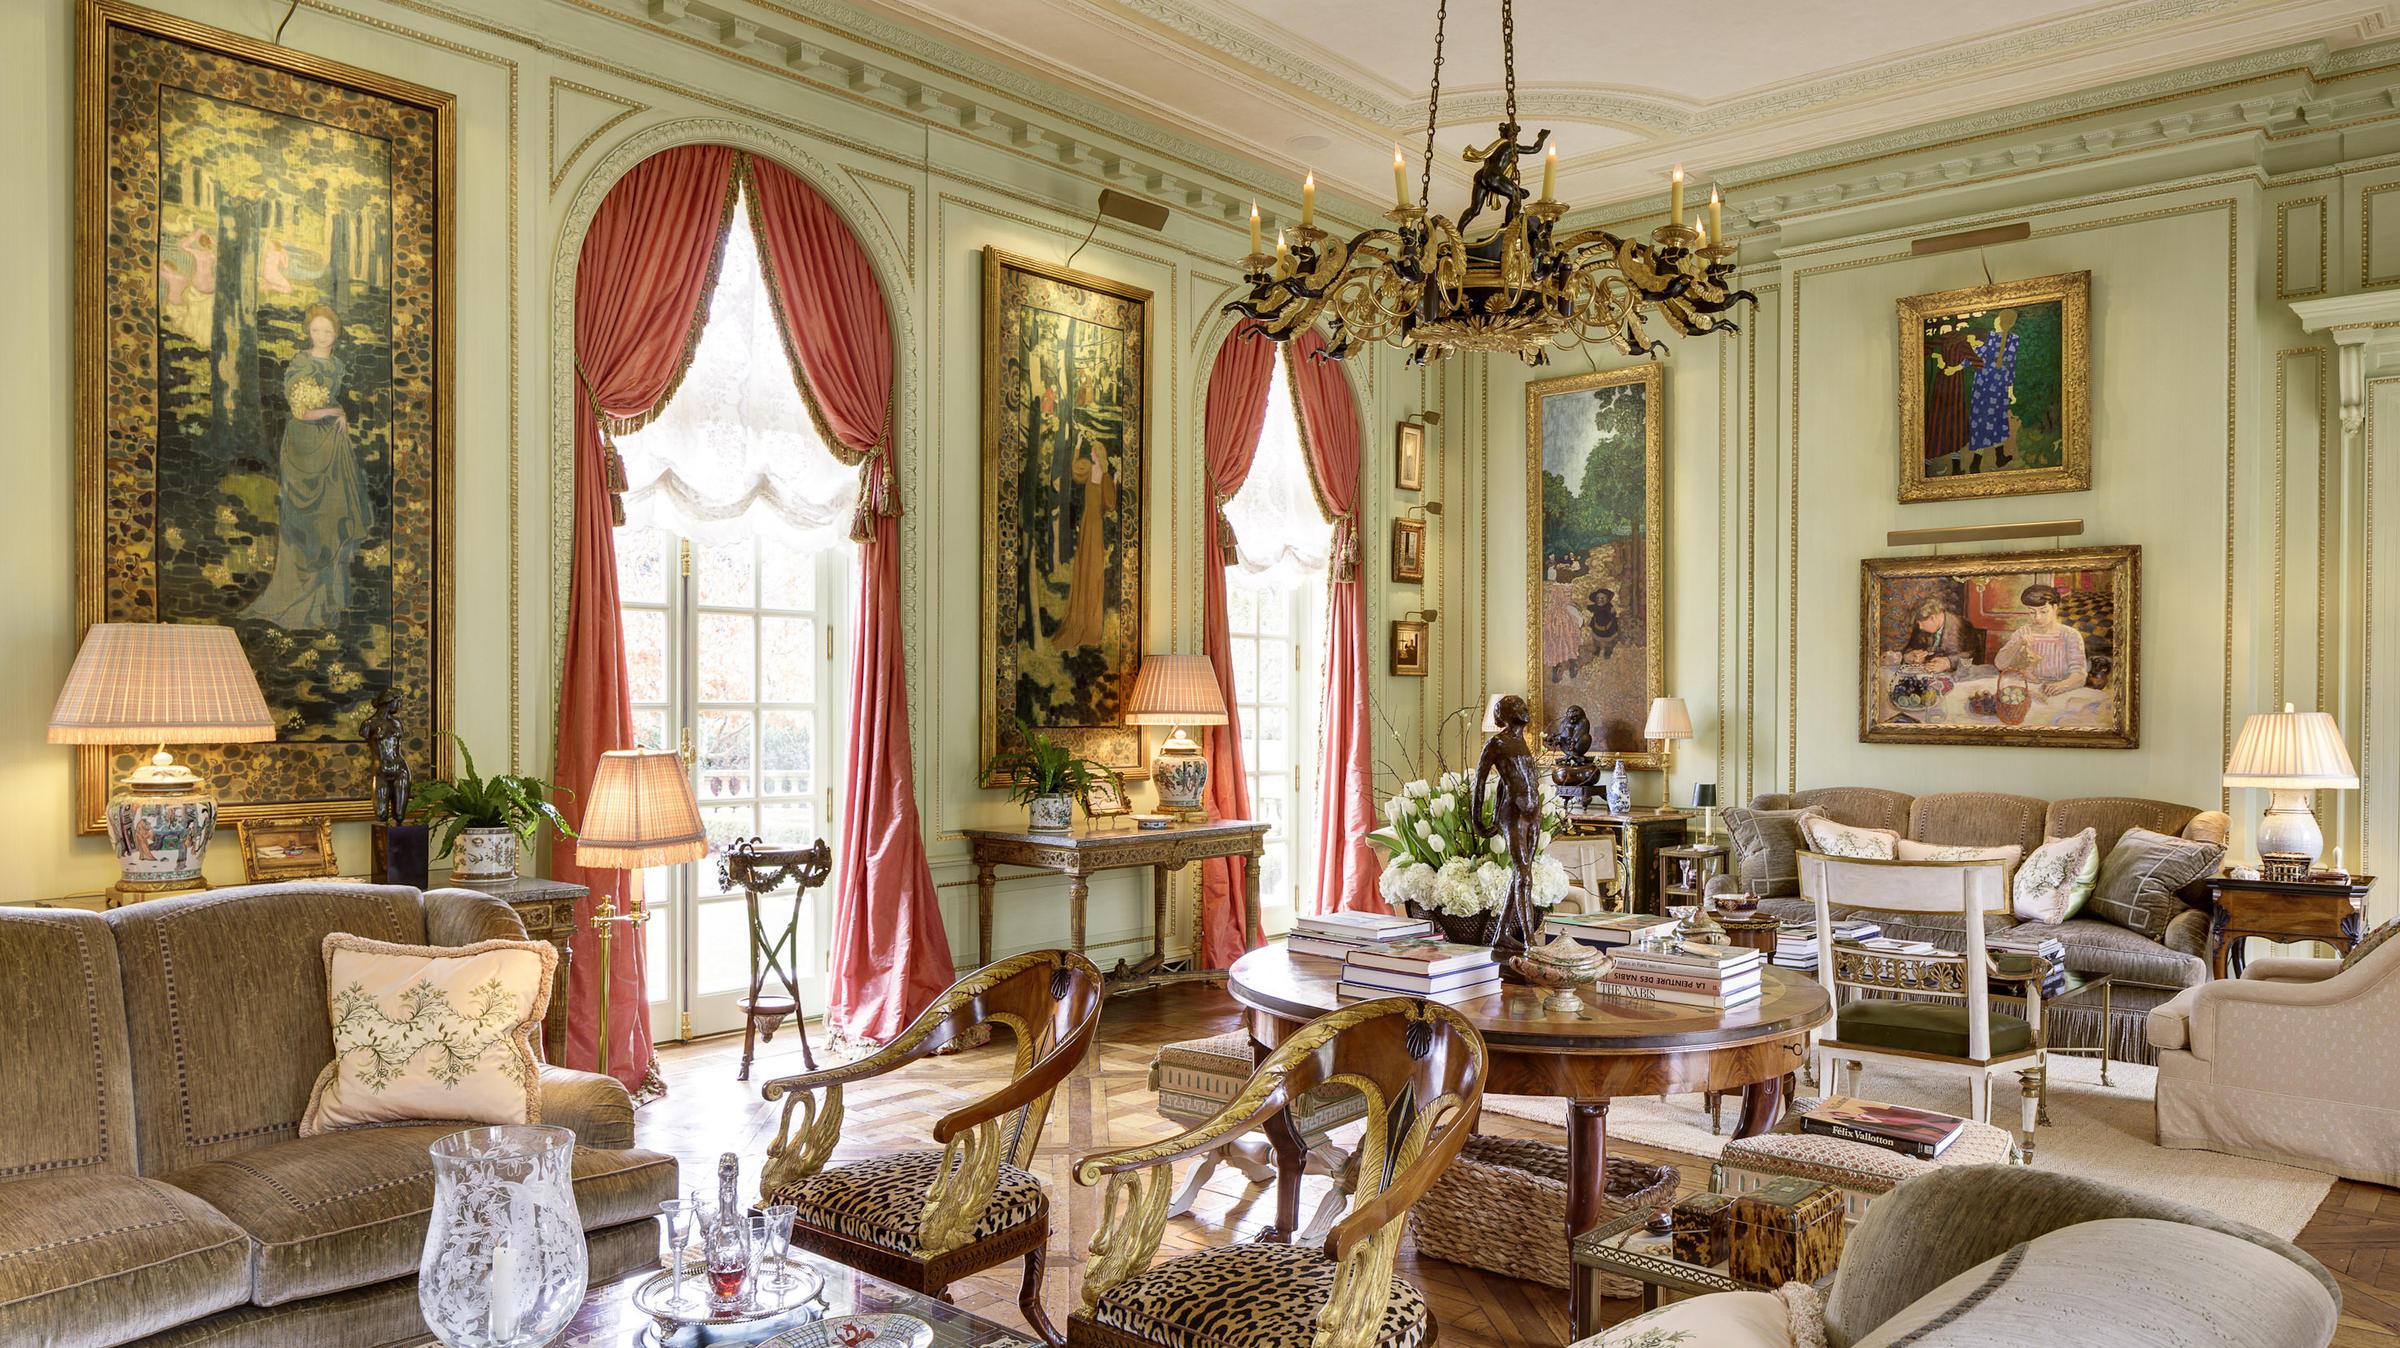 A Paris Vacation For Nashville Millionaires French Art Peoria